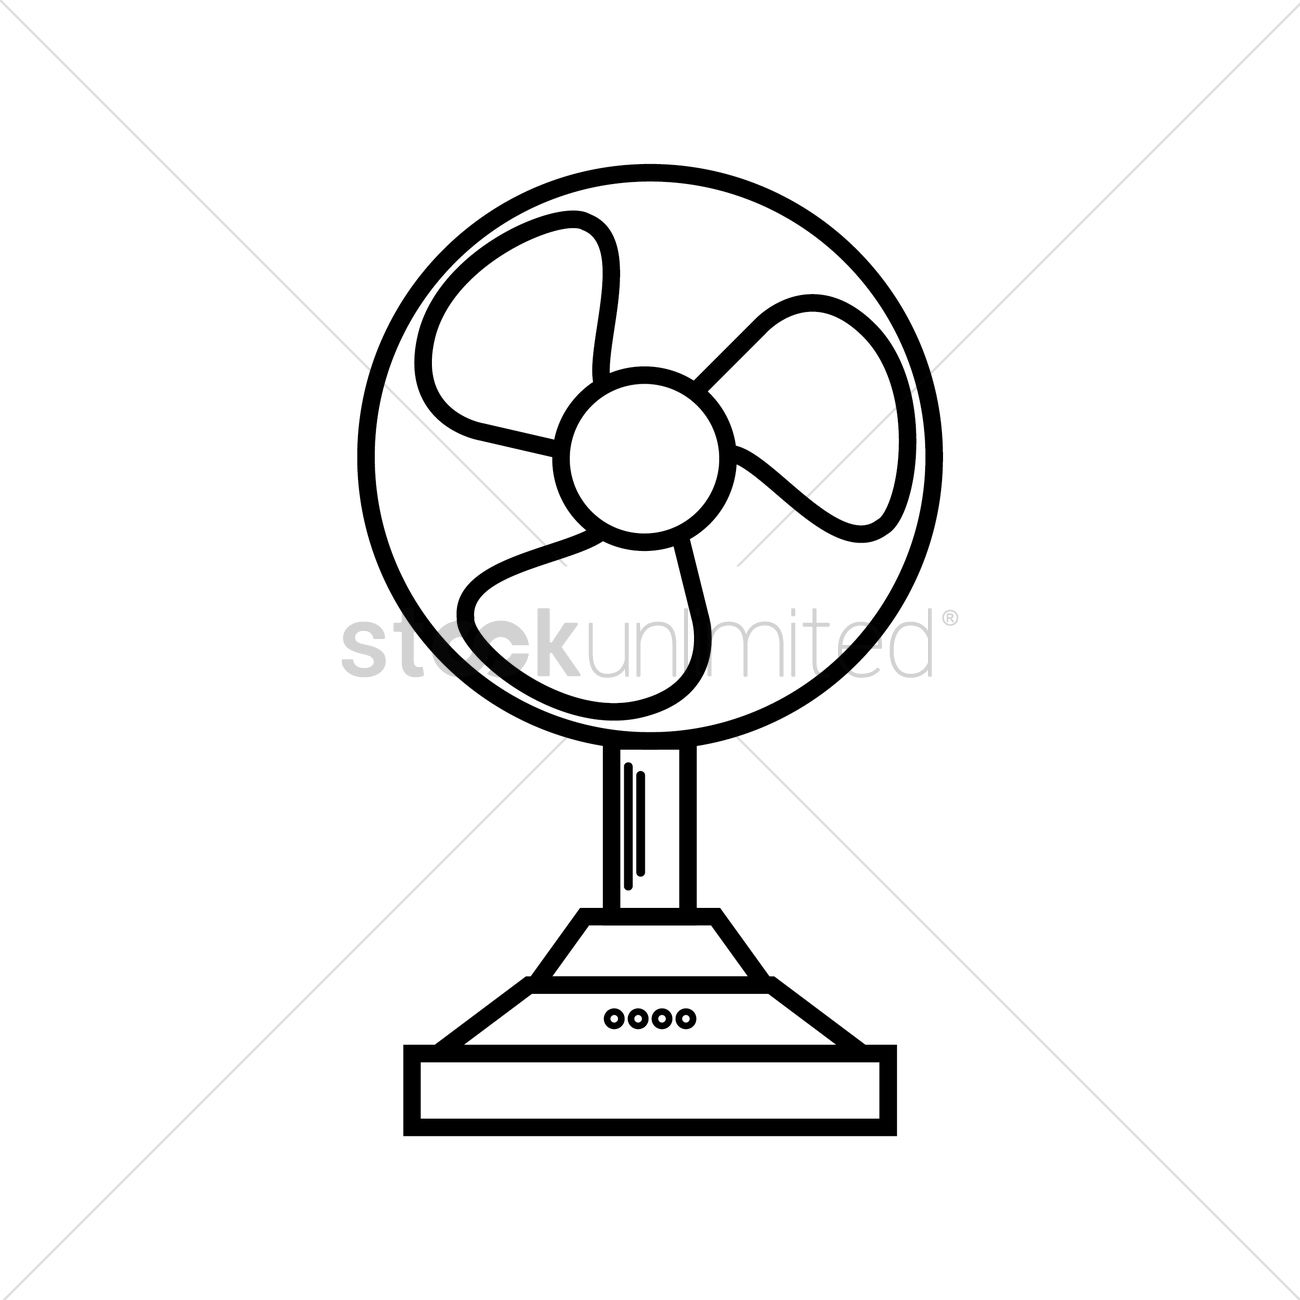 Fan Blade Outline : Table fan vector image stockunlimited